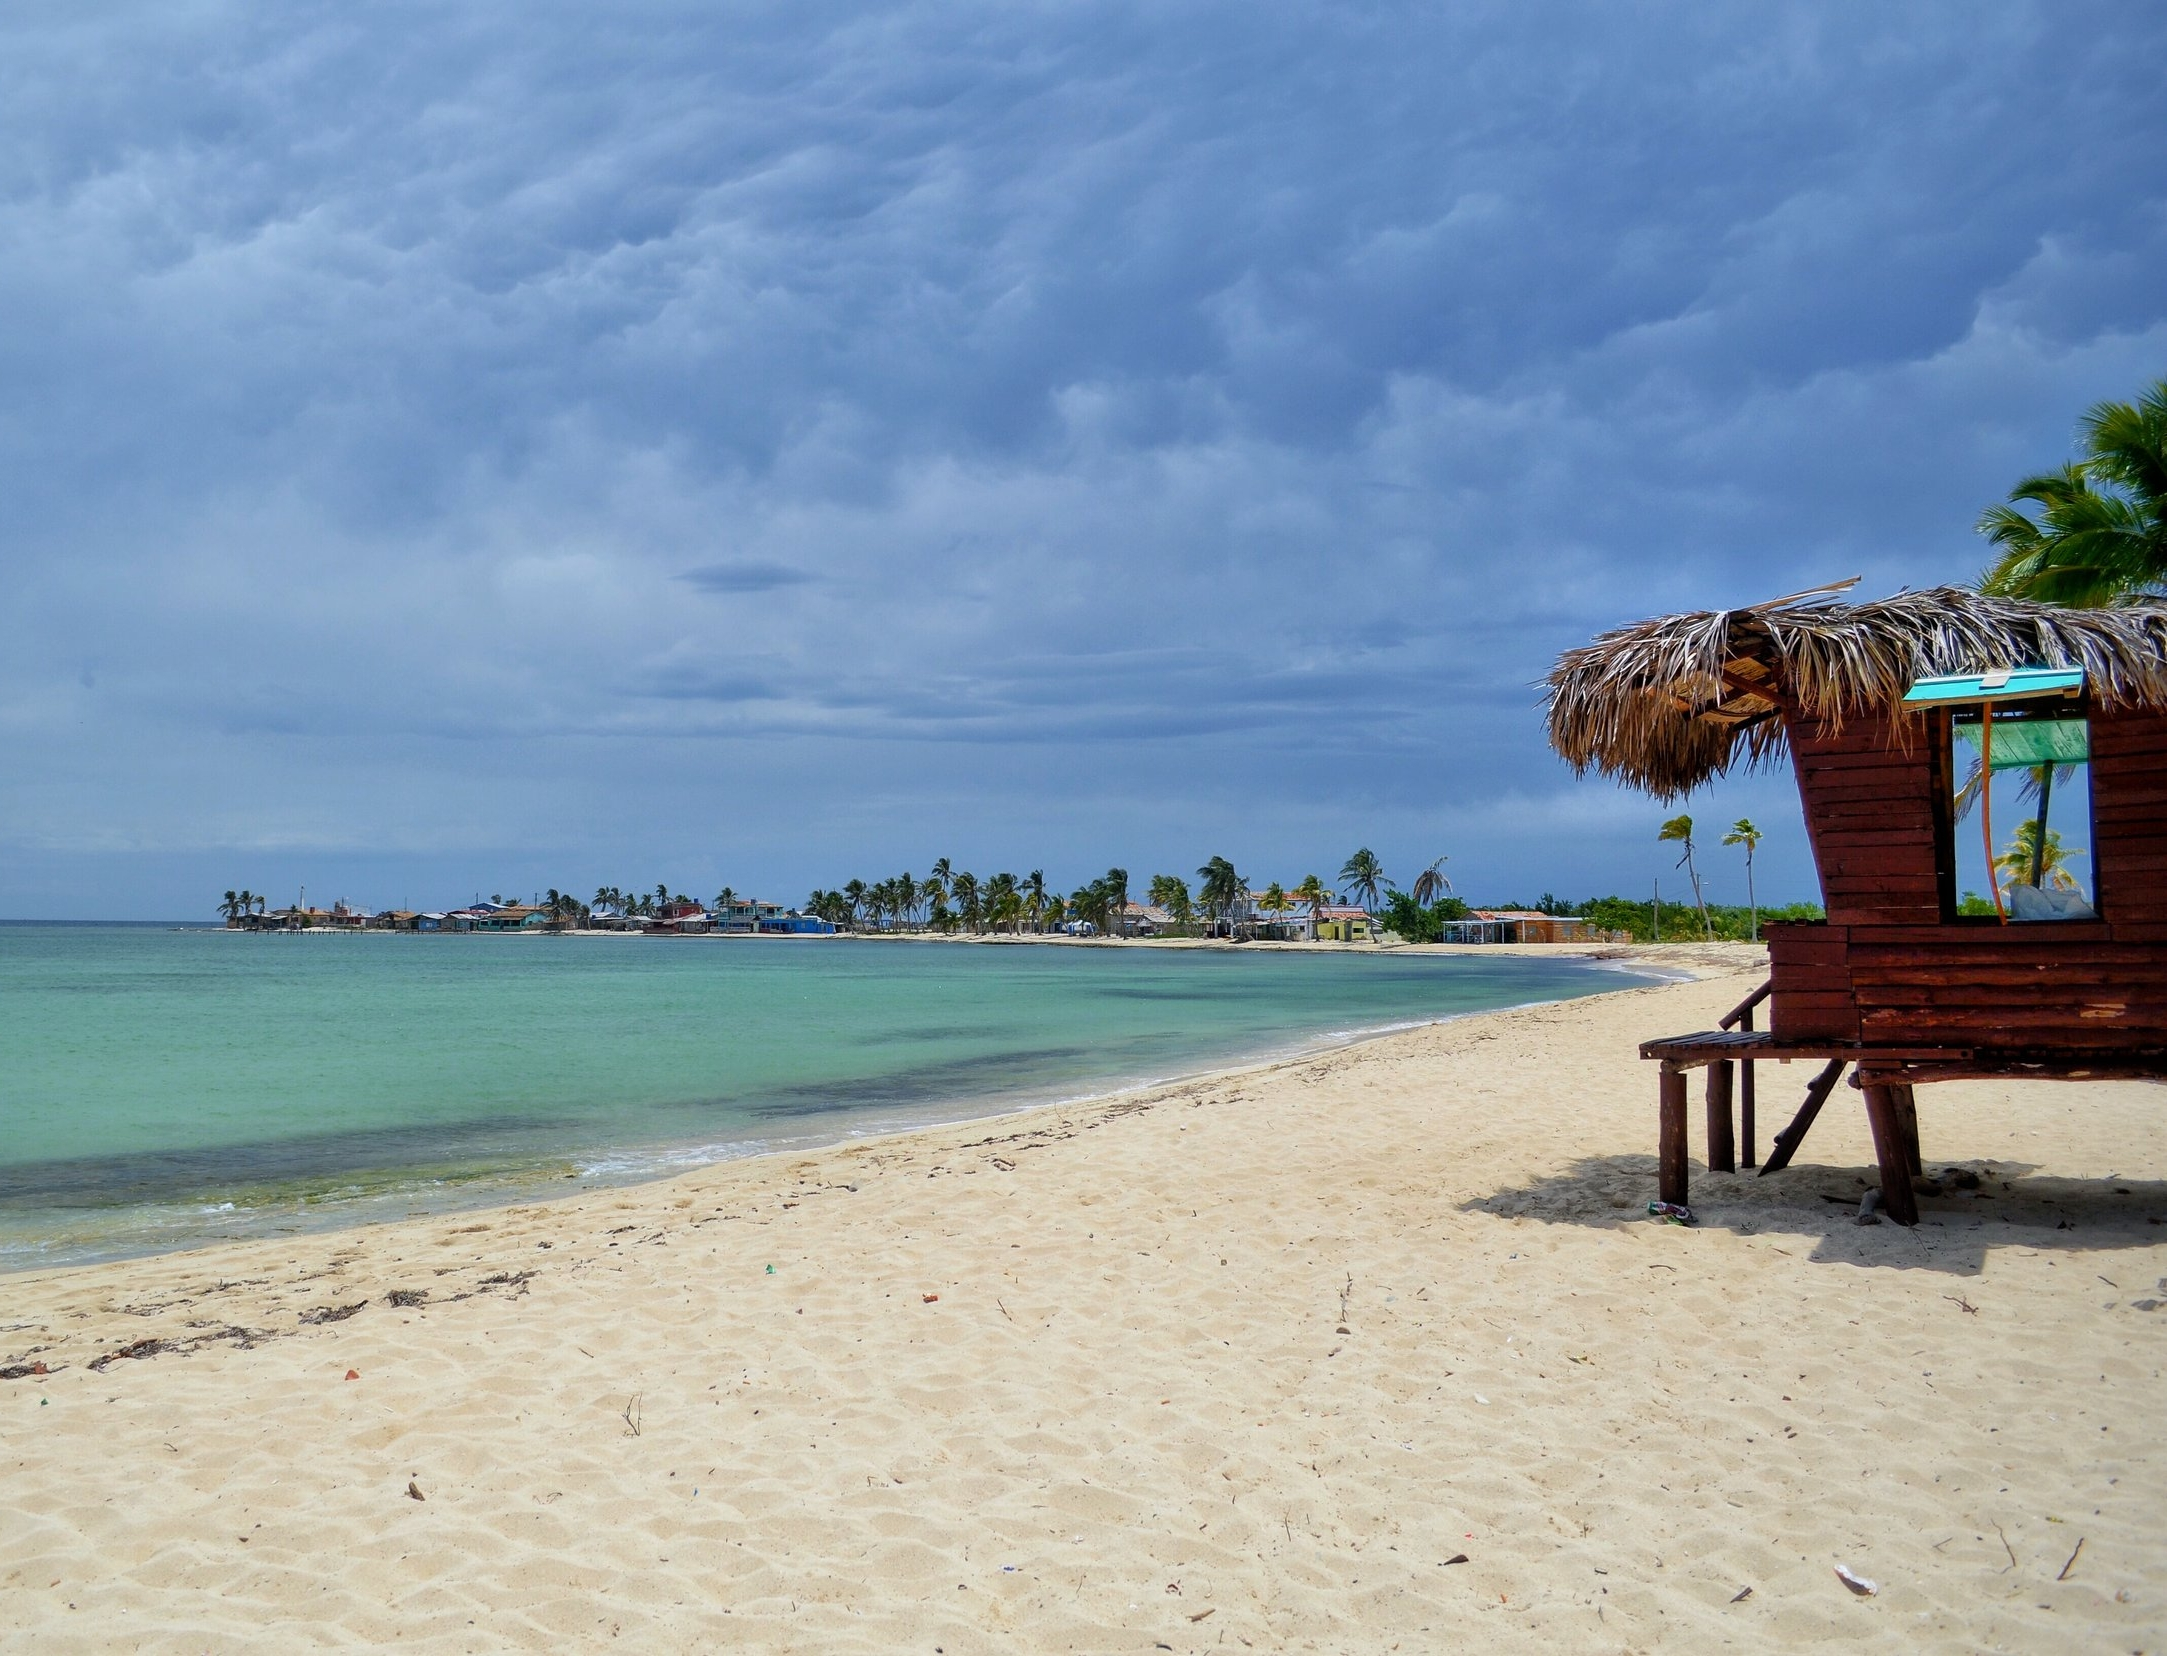 Playa Coco, near Camaguey, Cuba